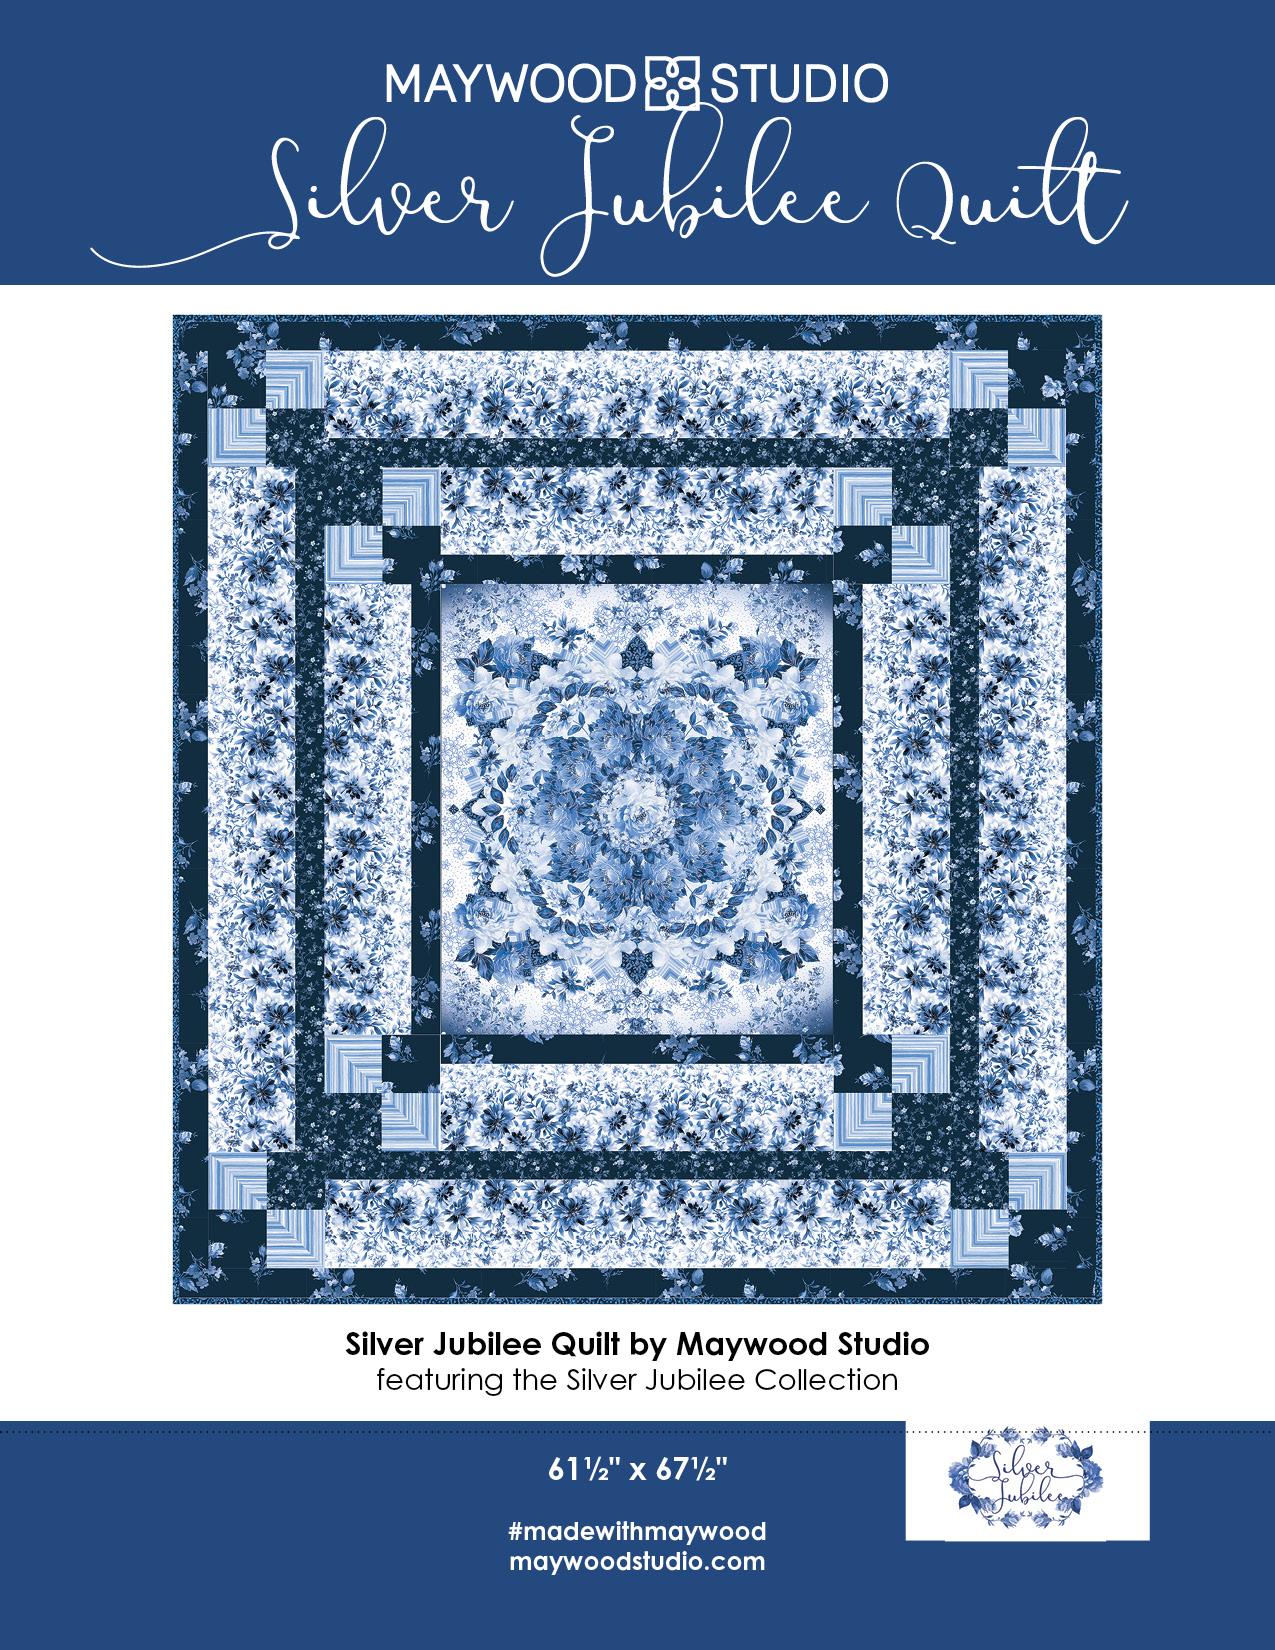 Silver Jubilee Quilt